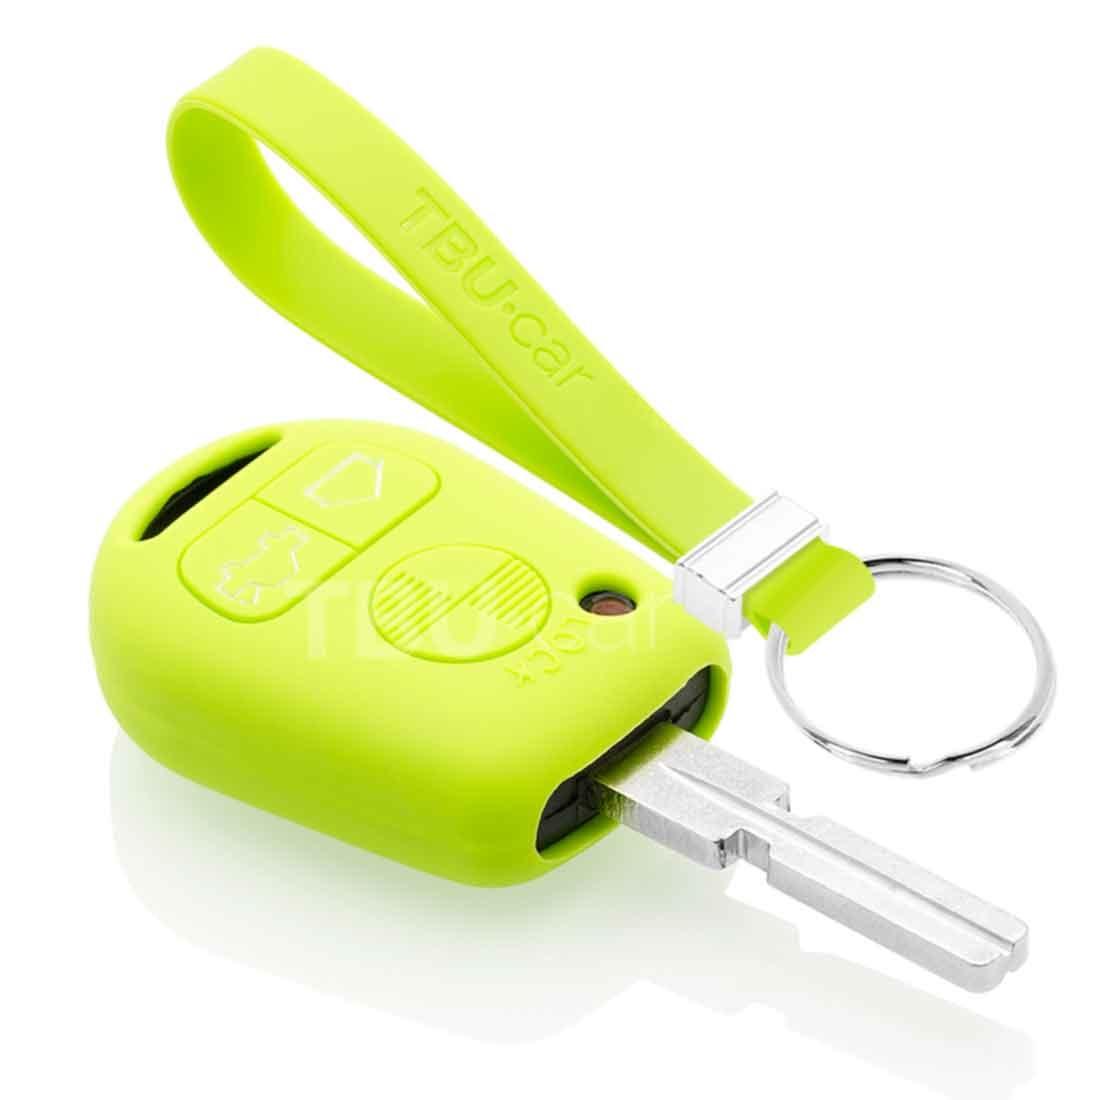 TBU car TBU car Autoschlüssel Hülle kompatibel mit BMW 3 Tasten - Schutzhülle aus Silikon - Auto Schlüsselhülle Cover in Lindgrün